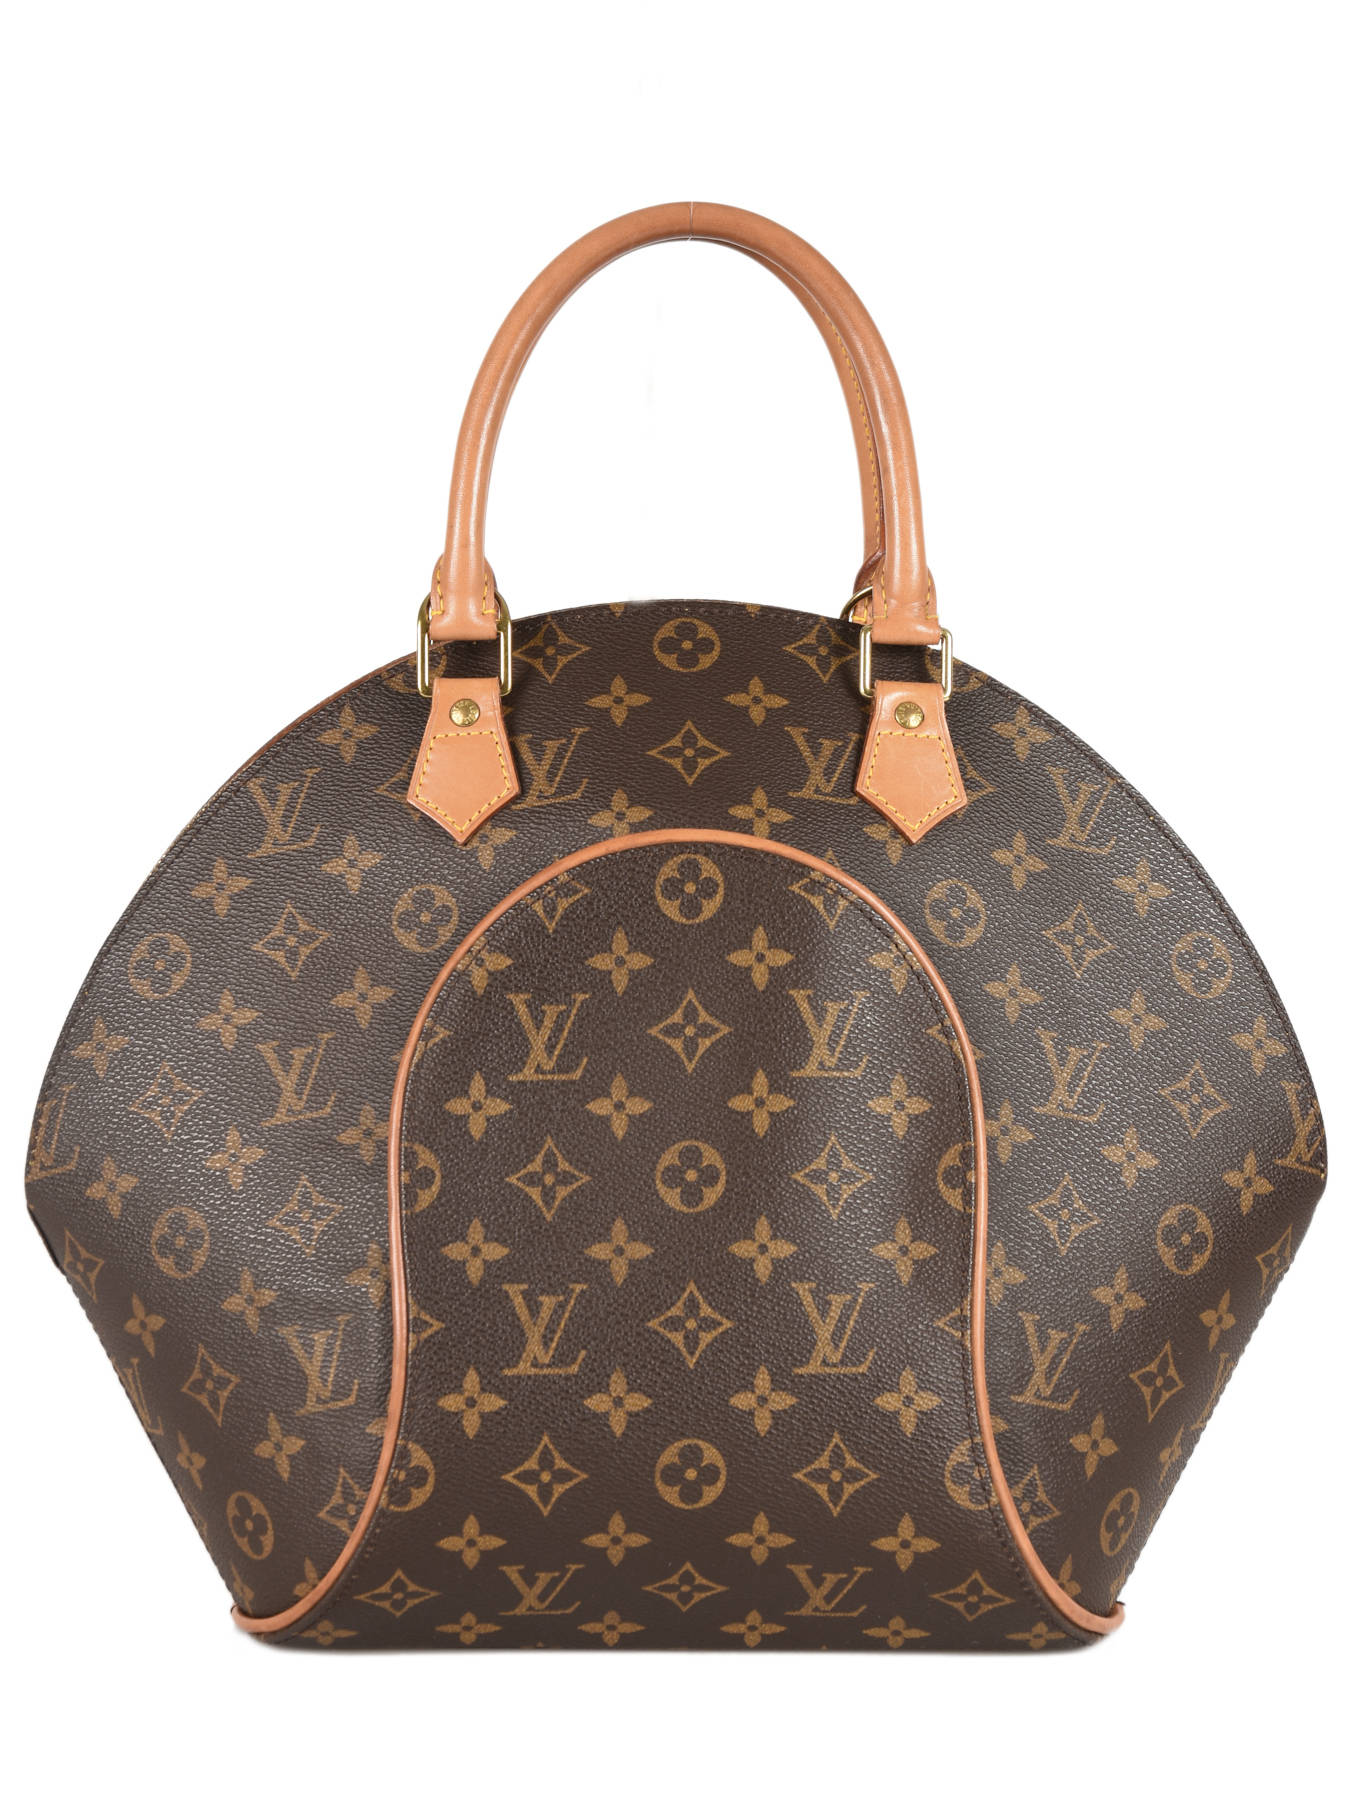 60e6014bf2a6 ... Preloved Louis Vuitton Handbag Ellipse Monogram Brand connection Brown louis  vuitton 60 ...